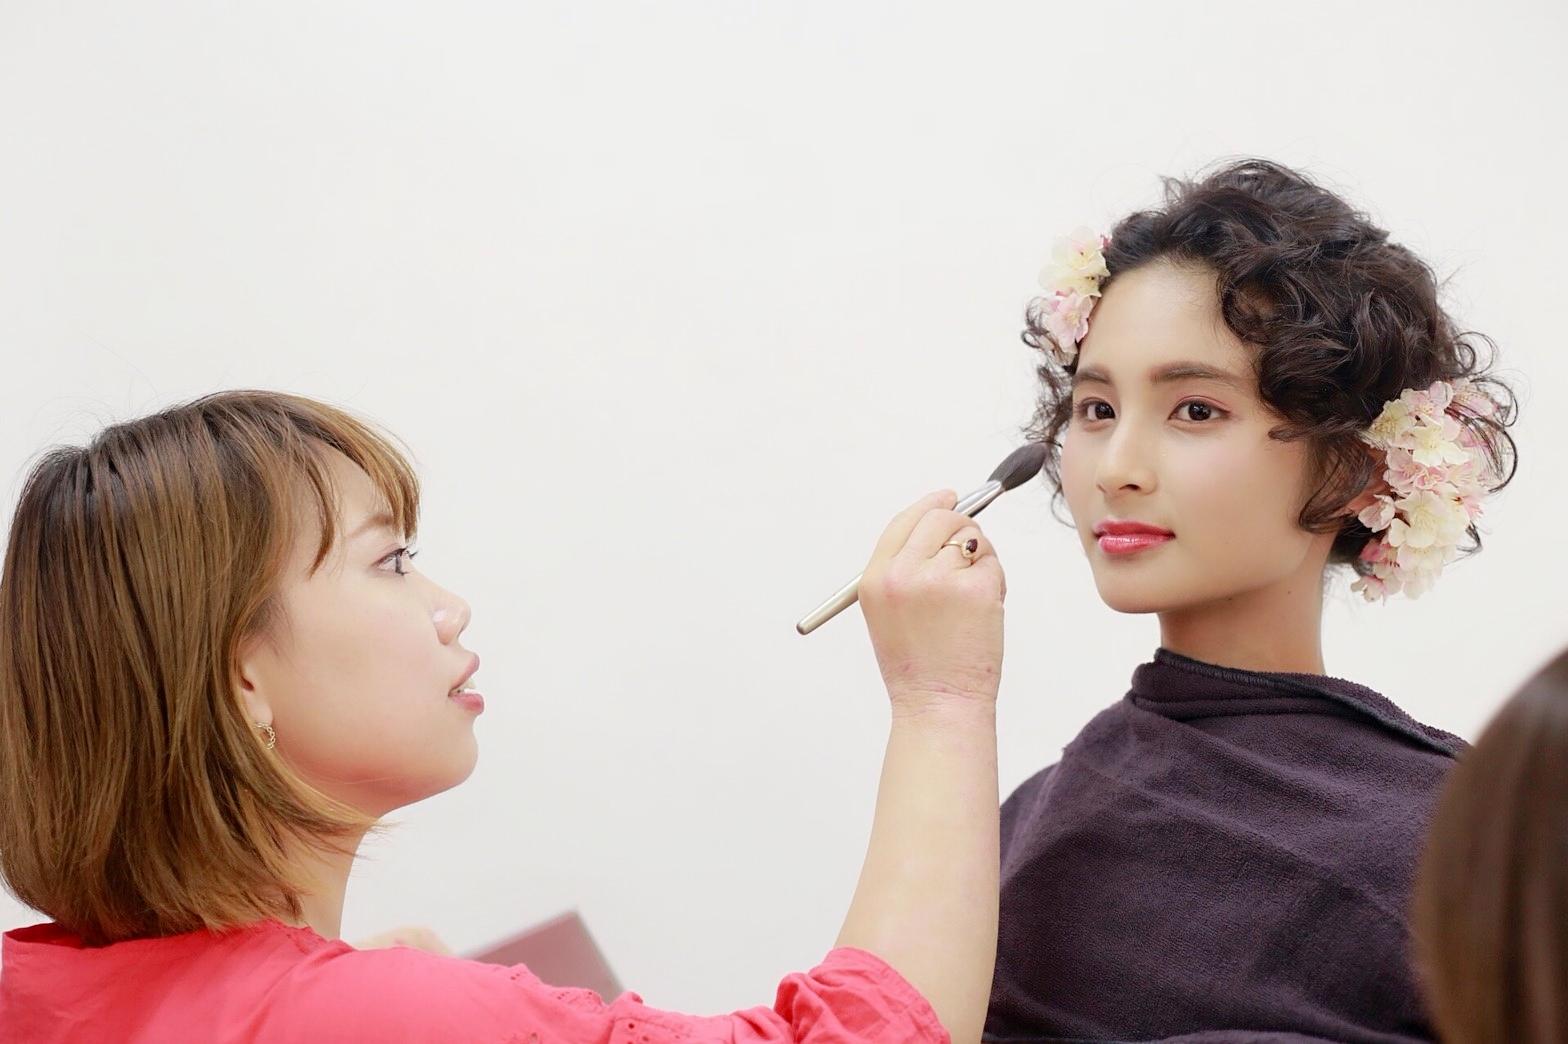 BeautyPlus_20181206181449743_save